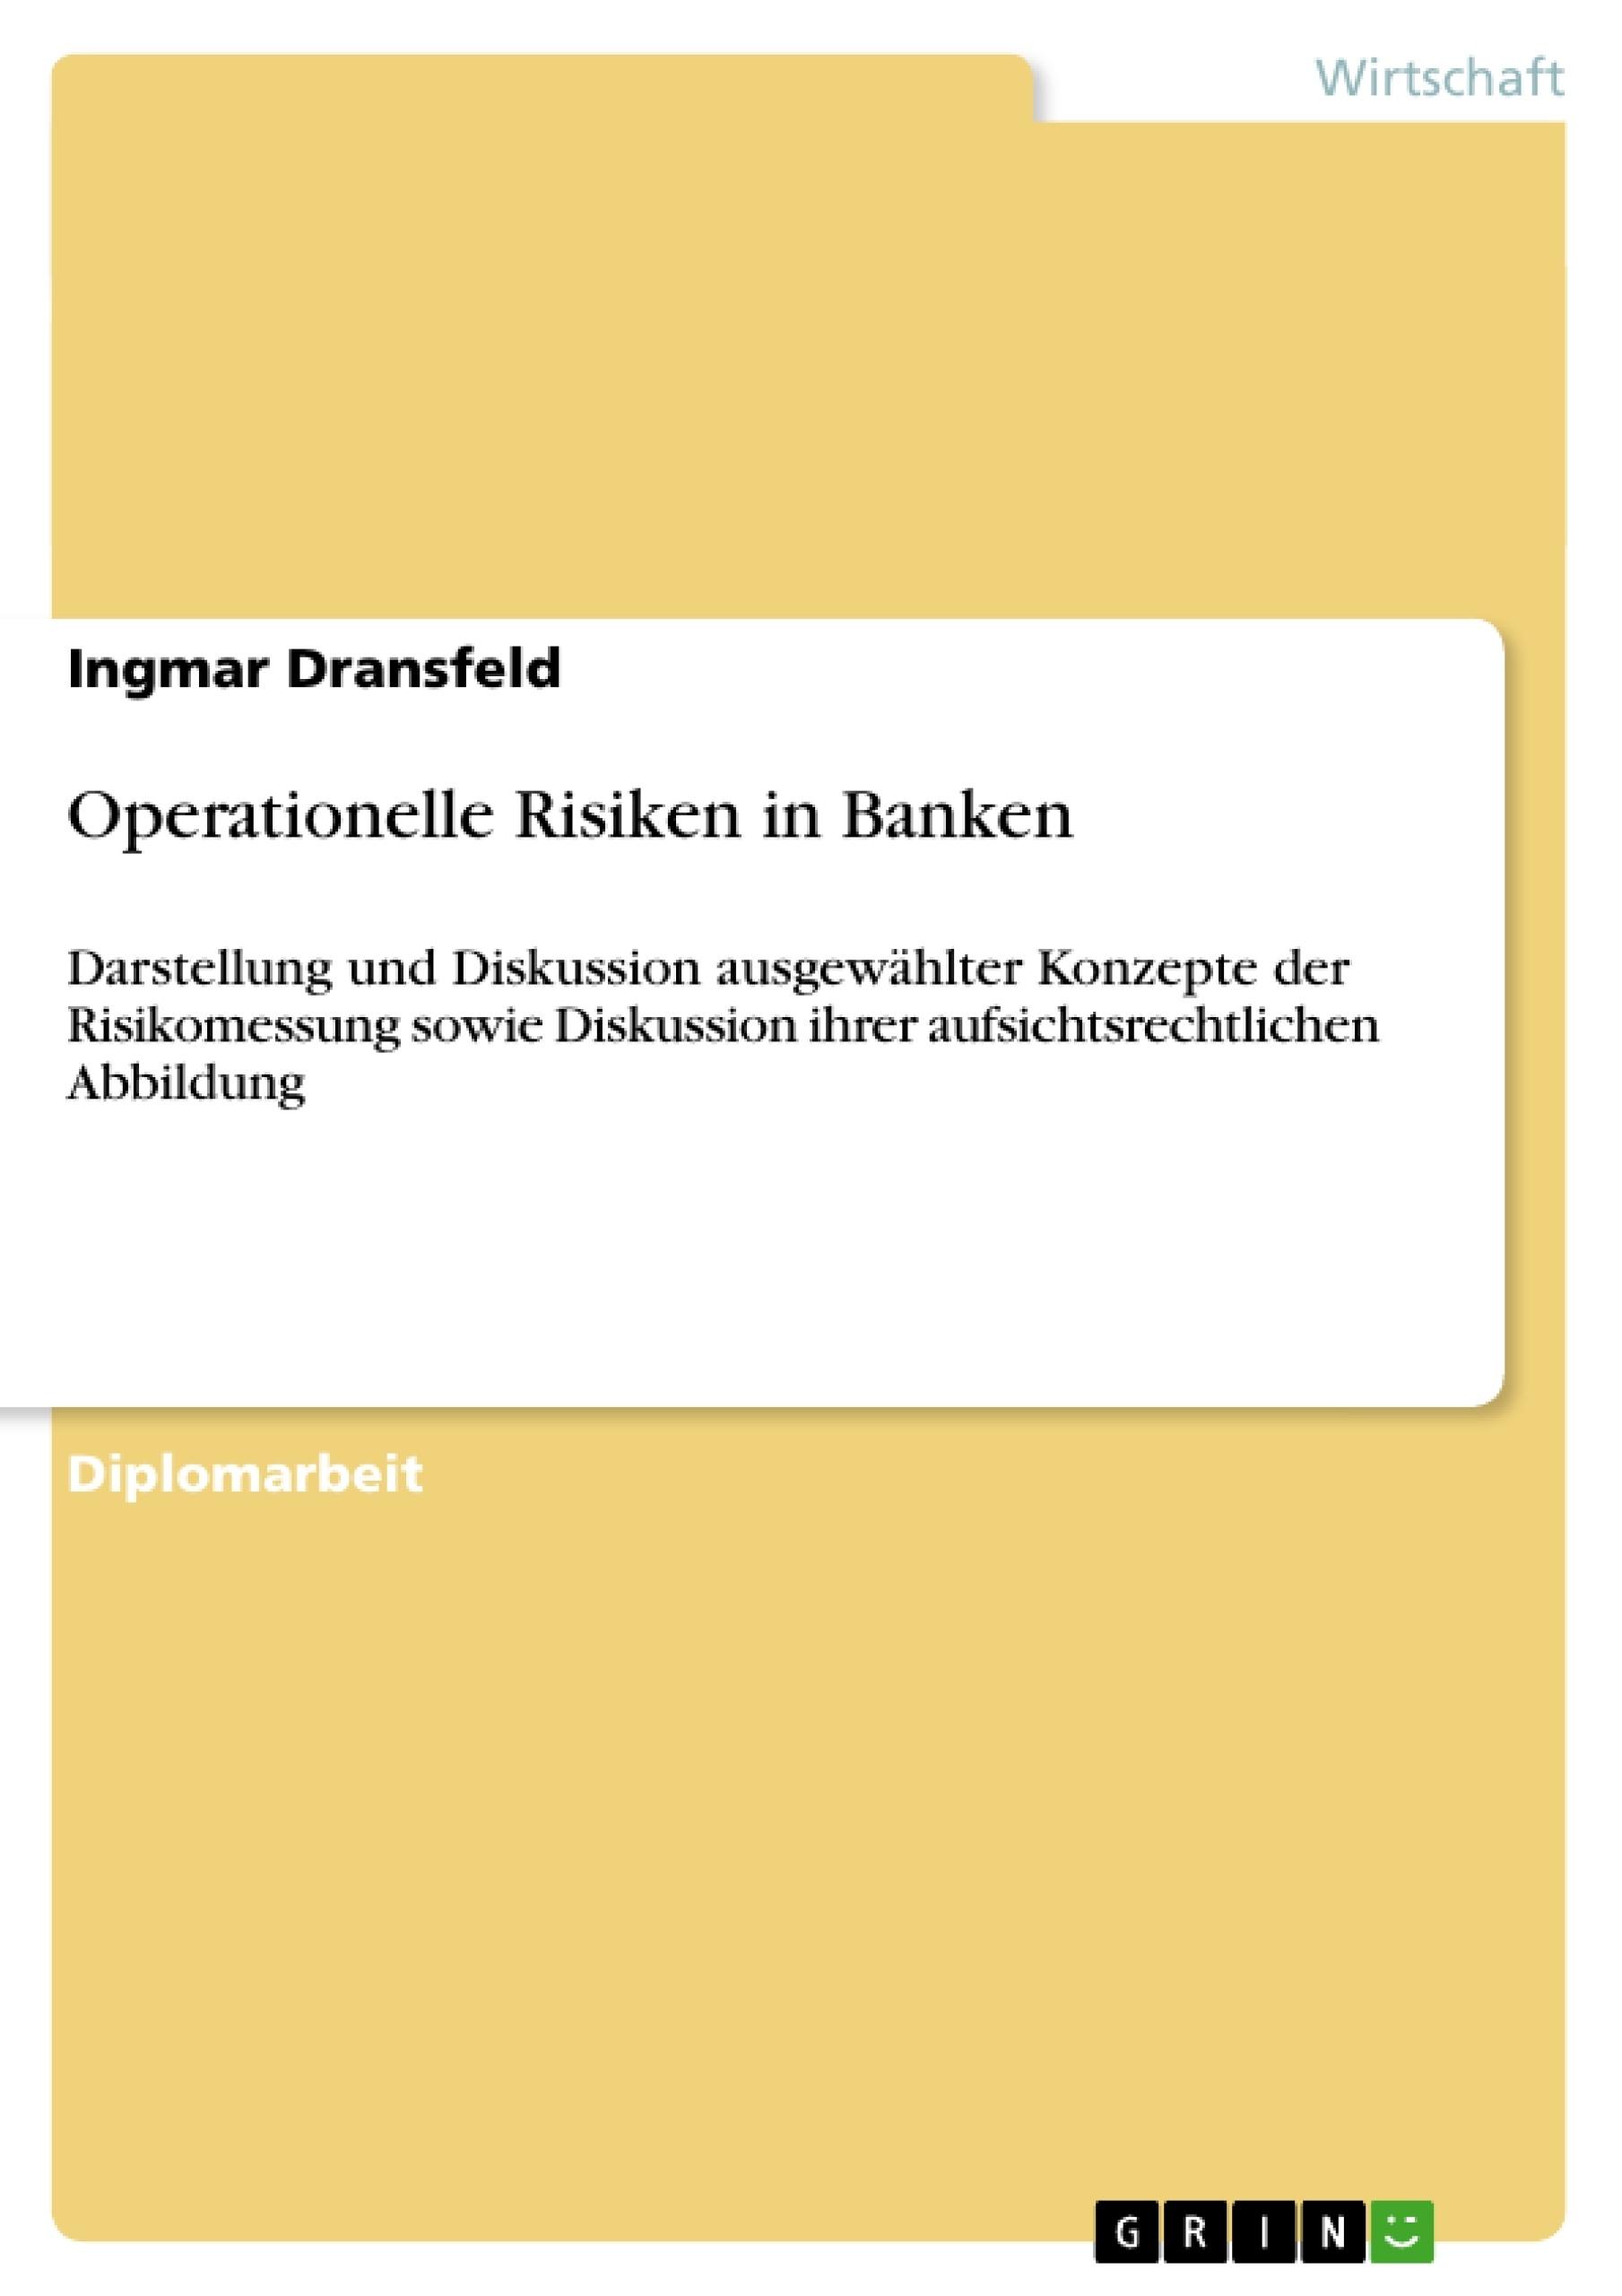 Titel: Operationelle Risiken in Banken